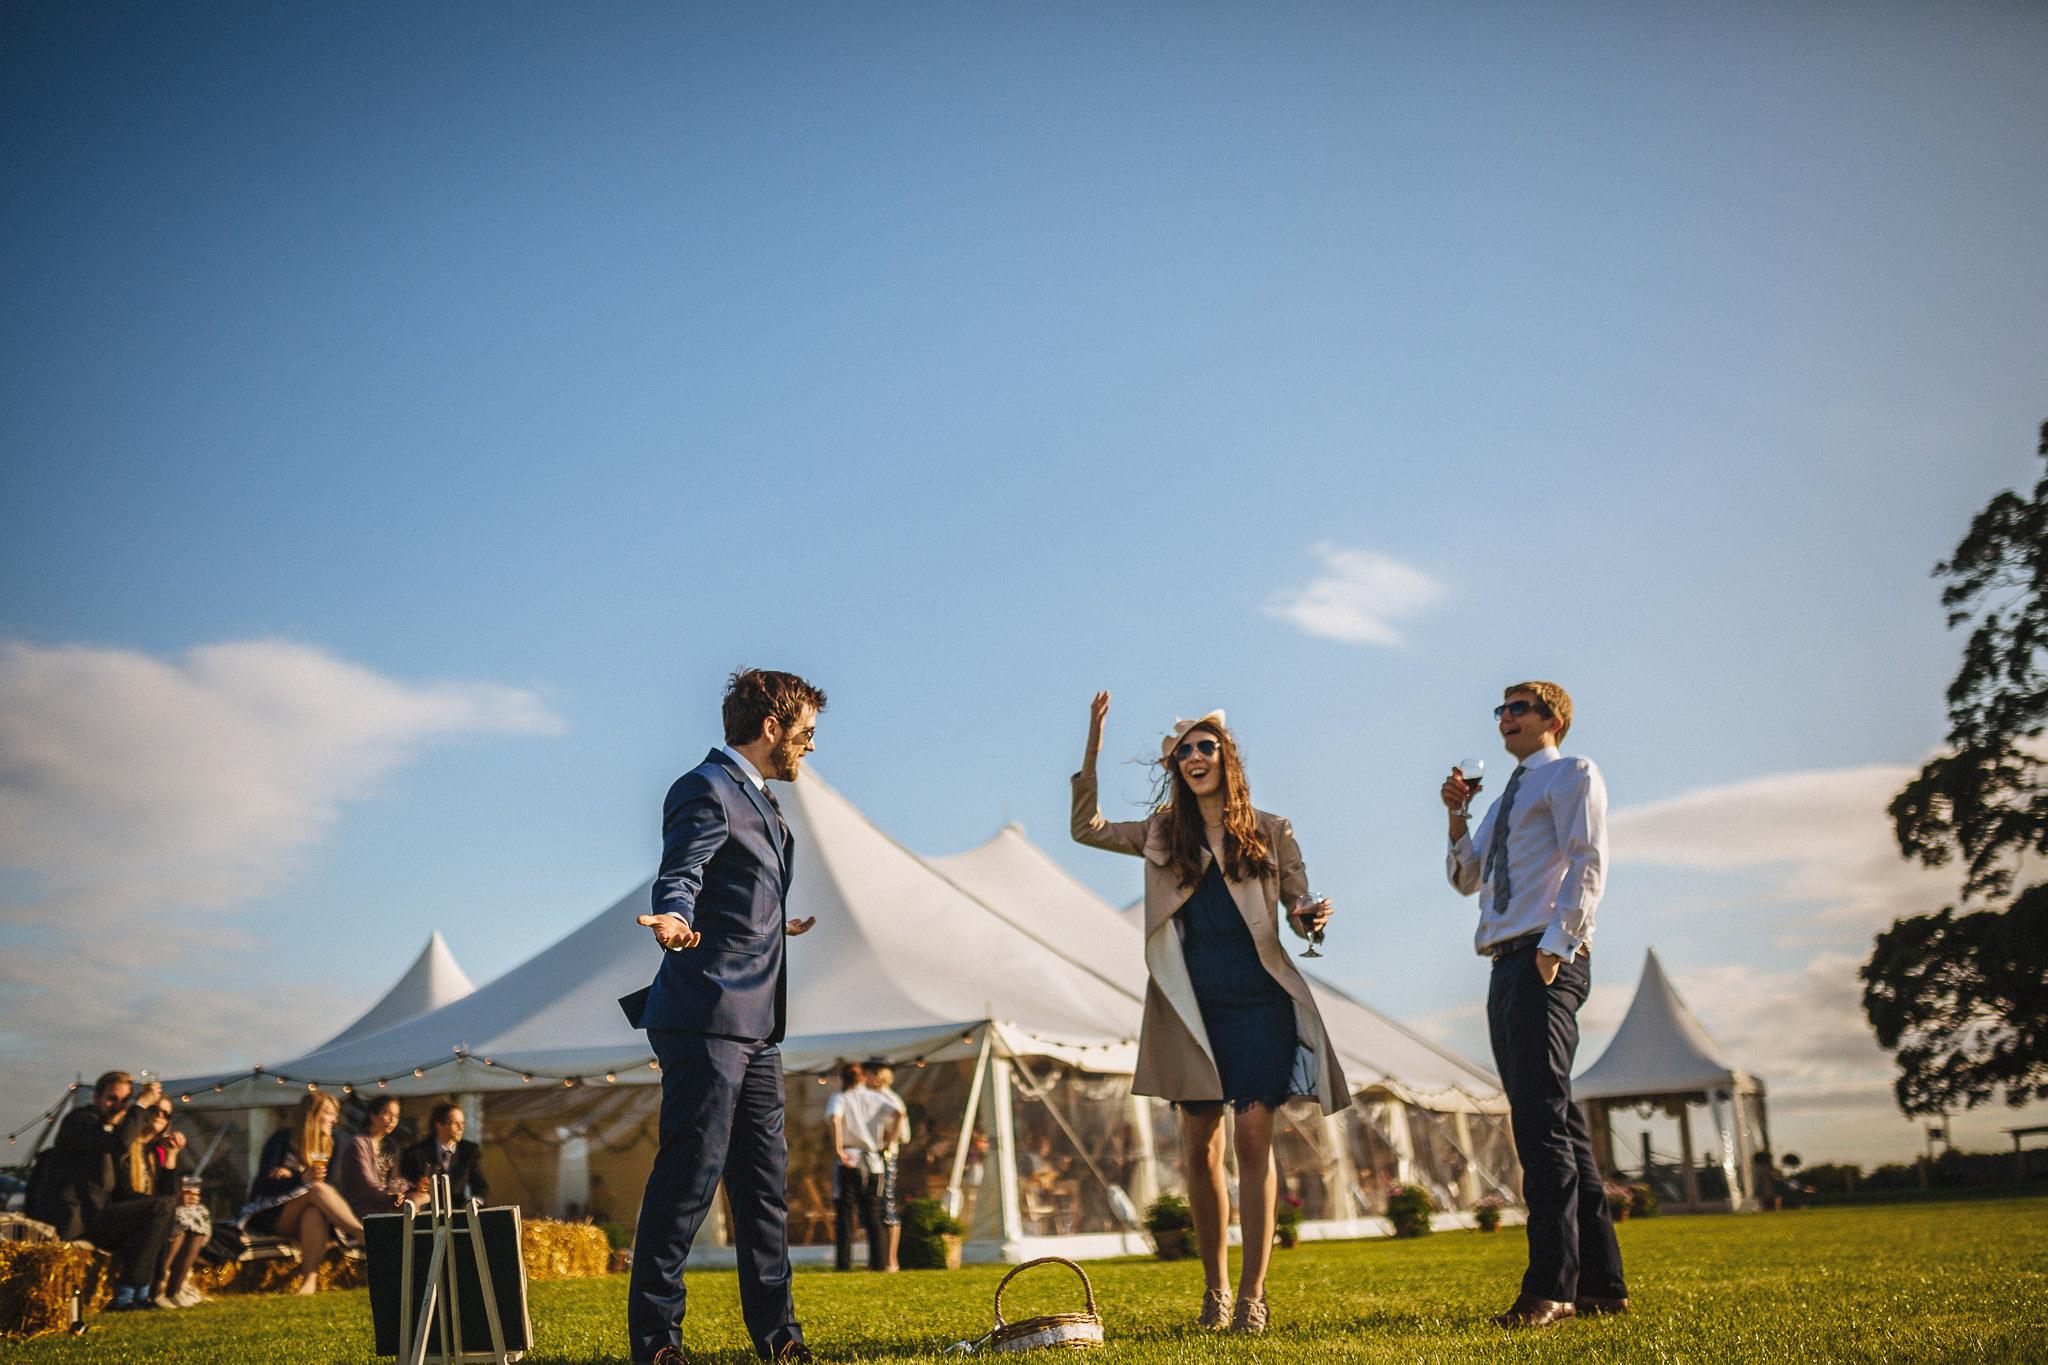 paul-marbrook-Farm-Wedding-Photographer-Lancashire-90075